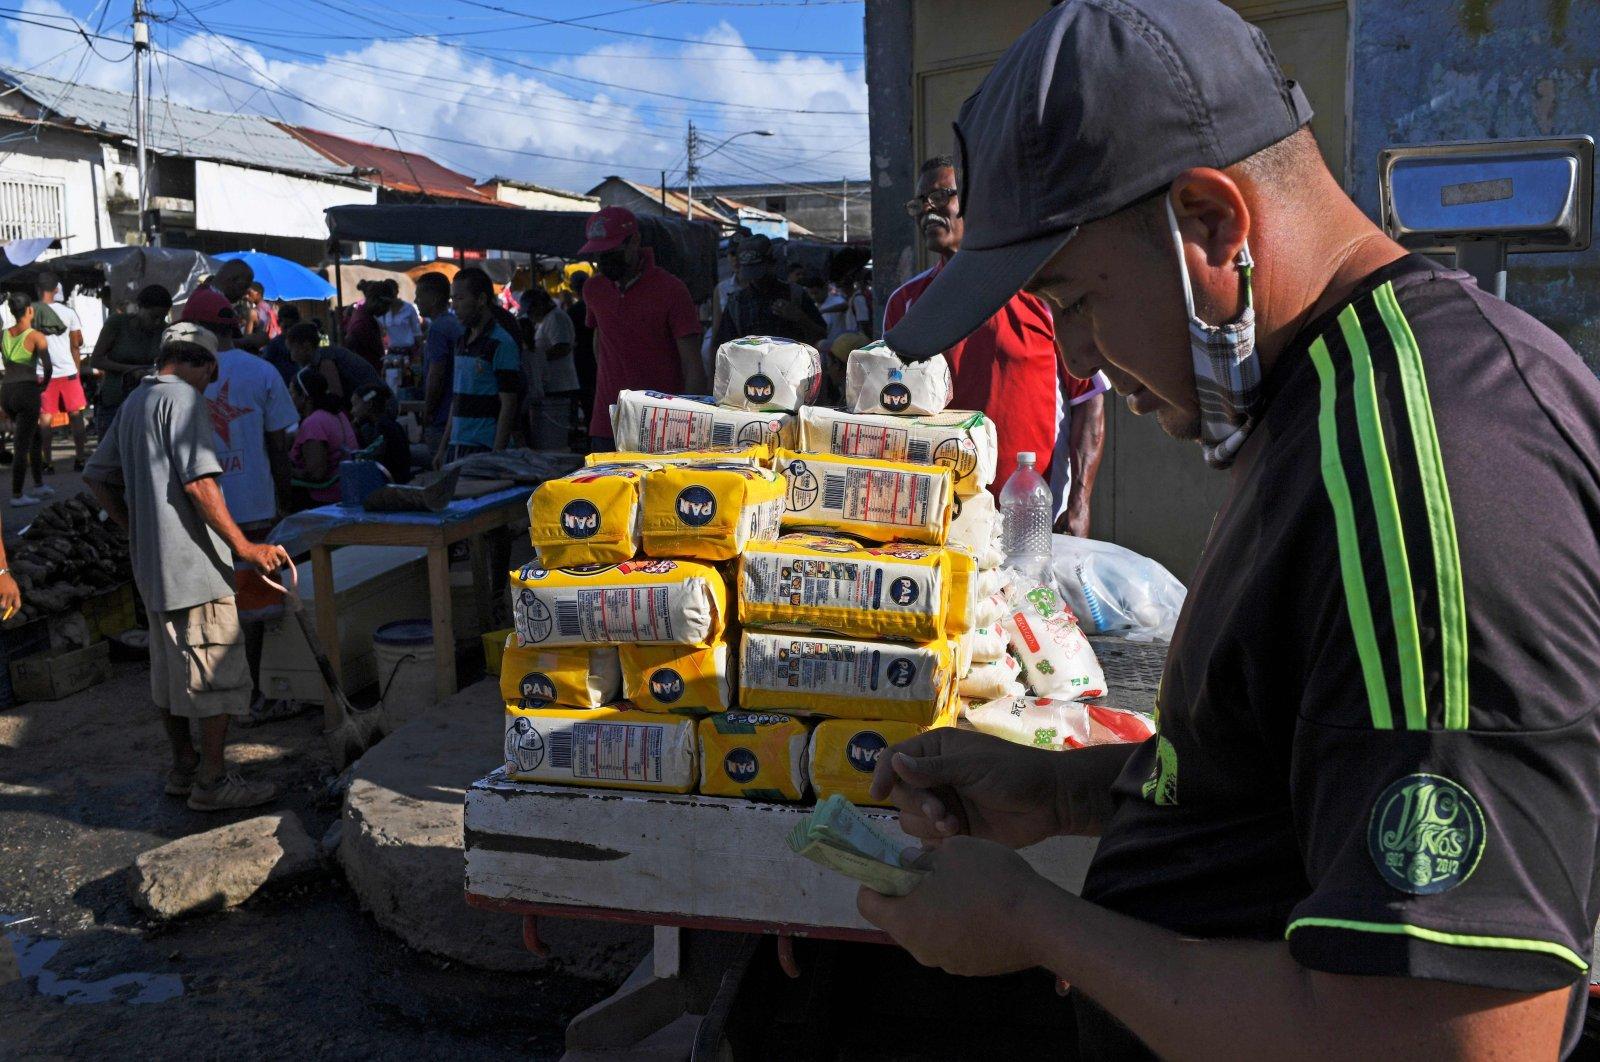 A Venezuelan merchant waits for customers as he sells corn flour at the street market in Guiria, Venezuela, Dec. 19, 2020. (AFP Photo)